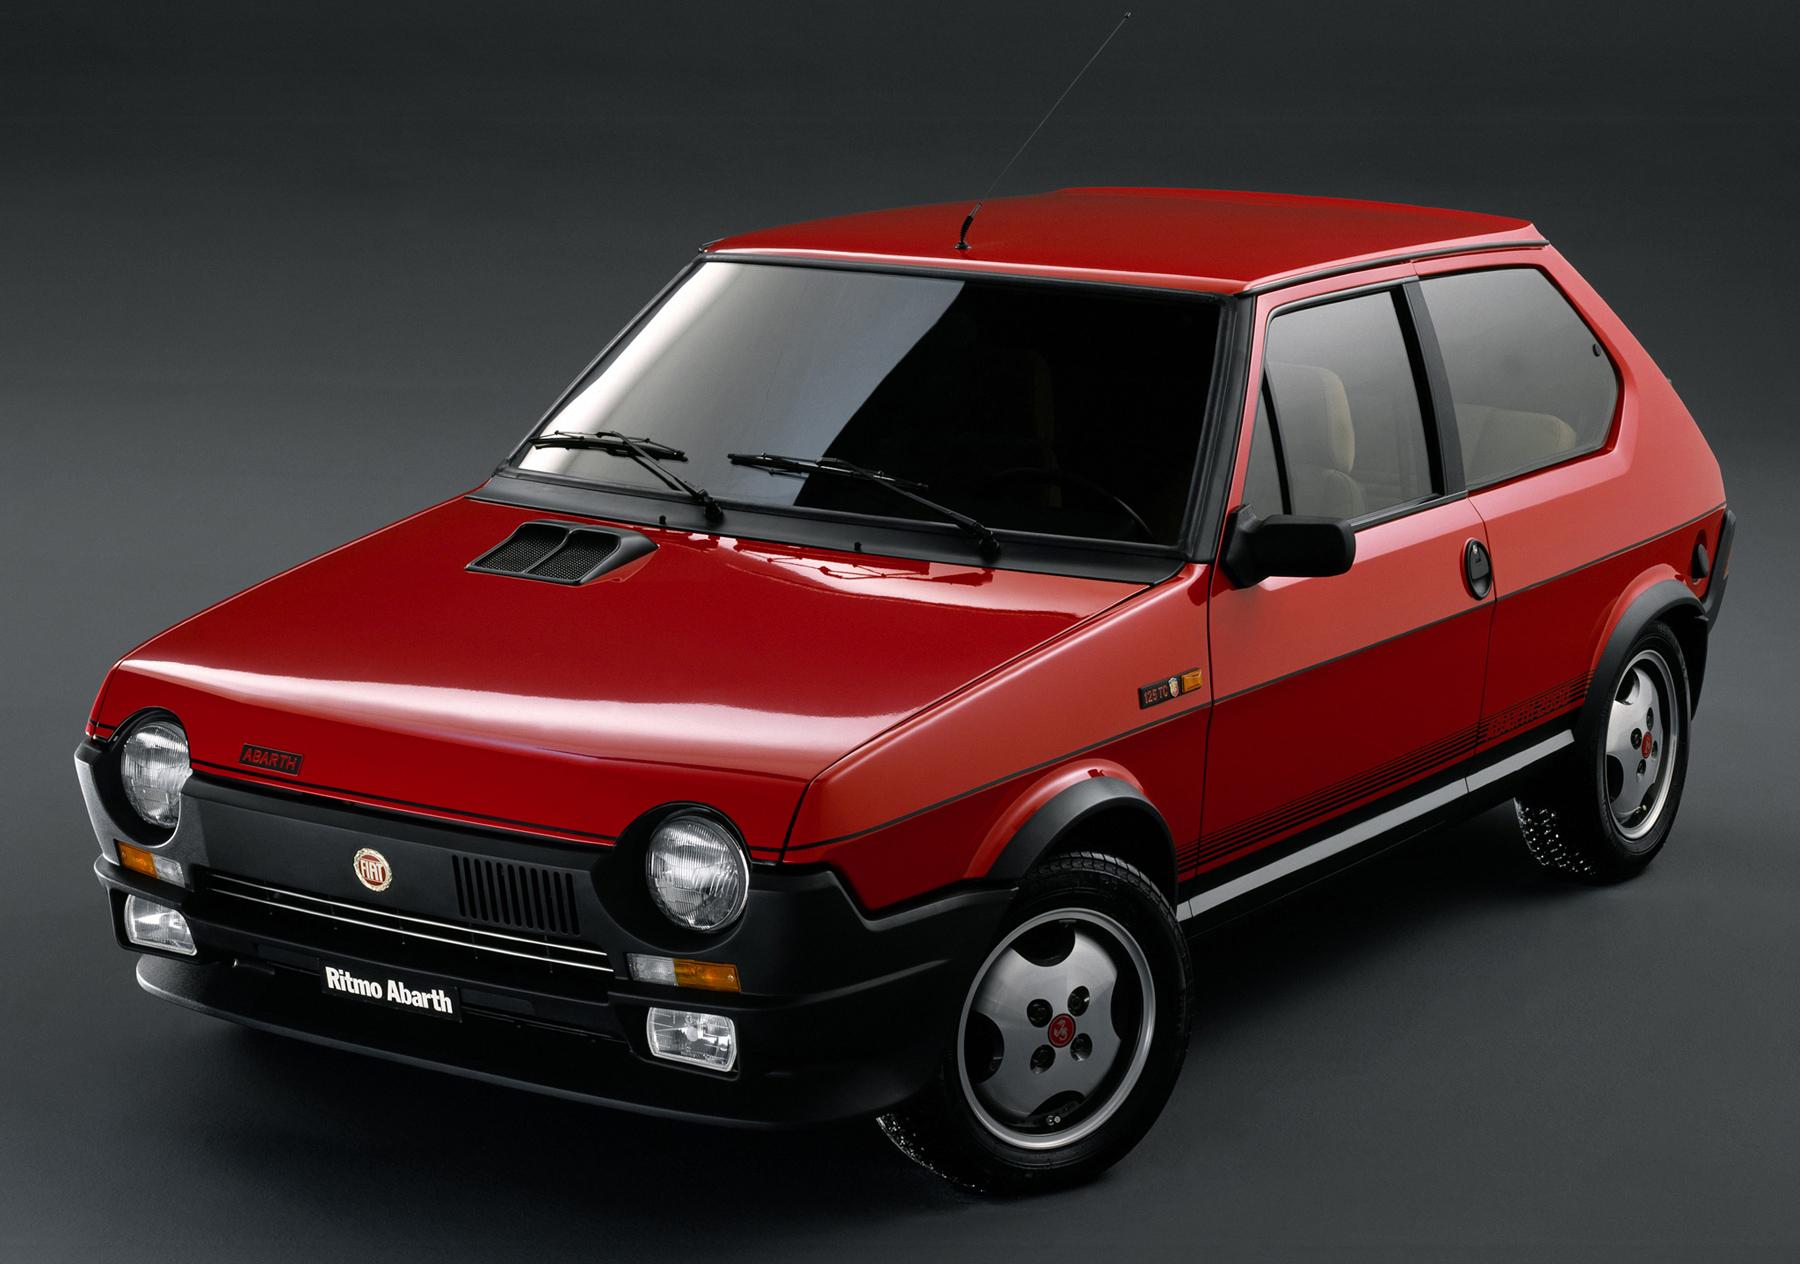 1981 FIAT RITMO ABARTH 125TC|アバルトの歴史を刻んだモデル No.019